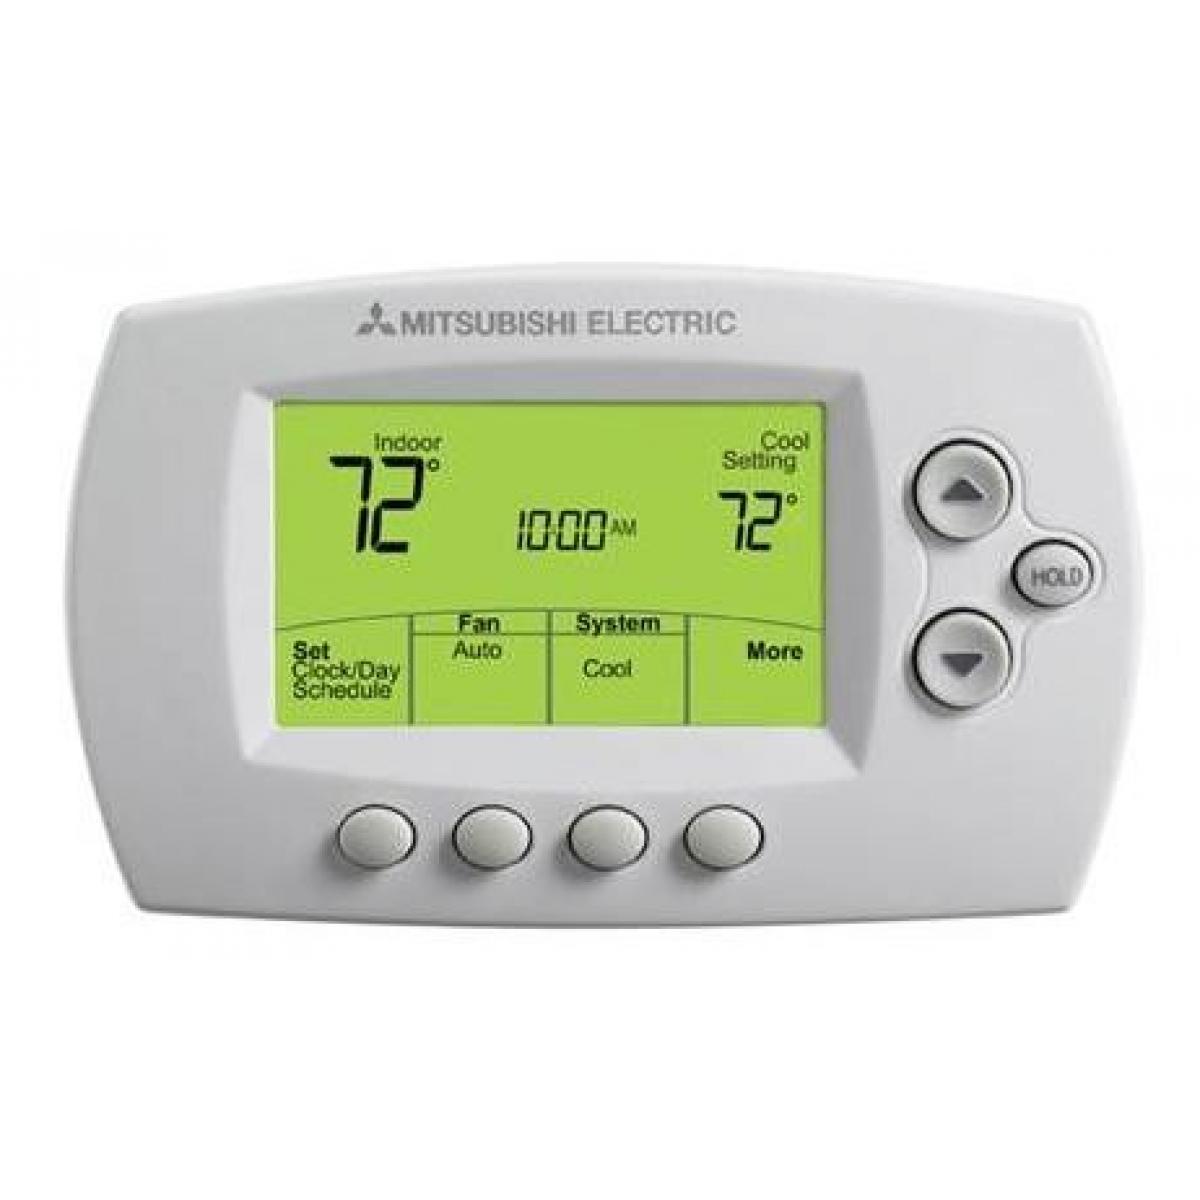 12k Btu Mitsubishi Slzka Ceiling Cassette Heat Pump Indoor